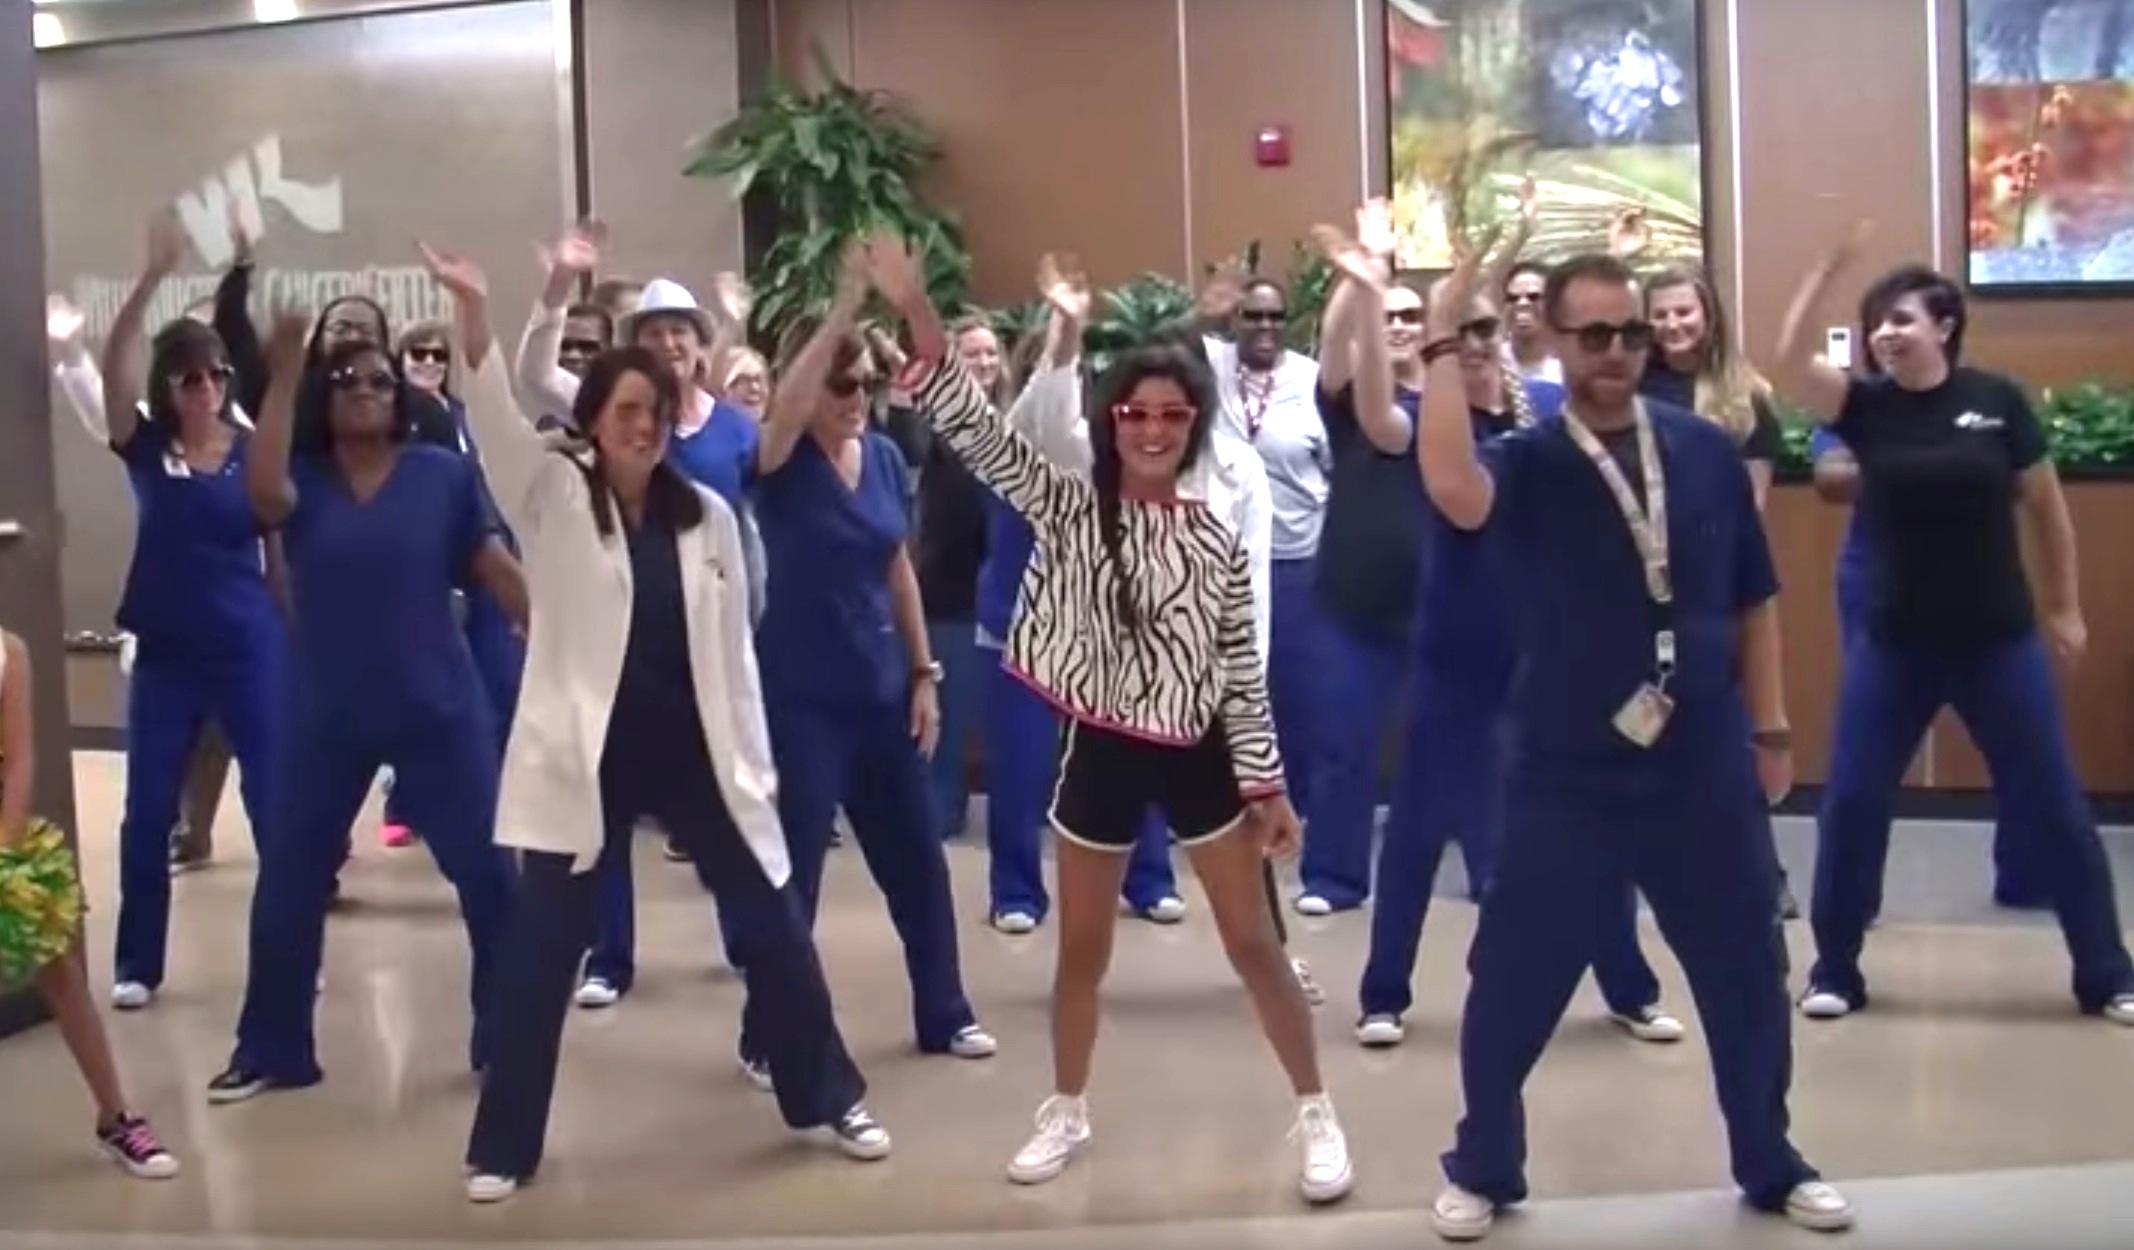 Girl Medical Staff Dance To Whip Nae Nae To Celebrate